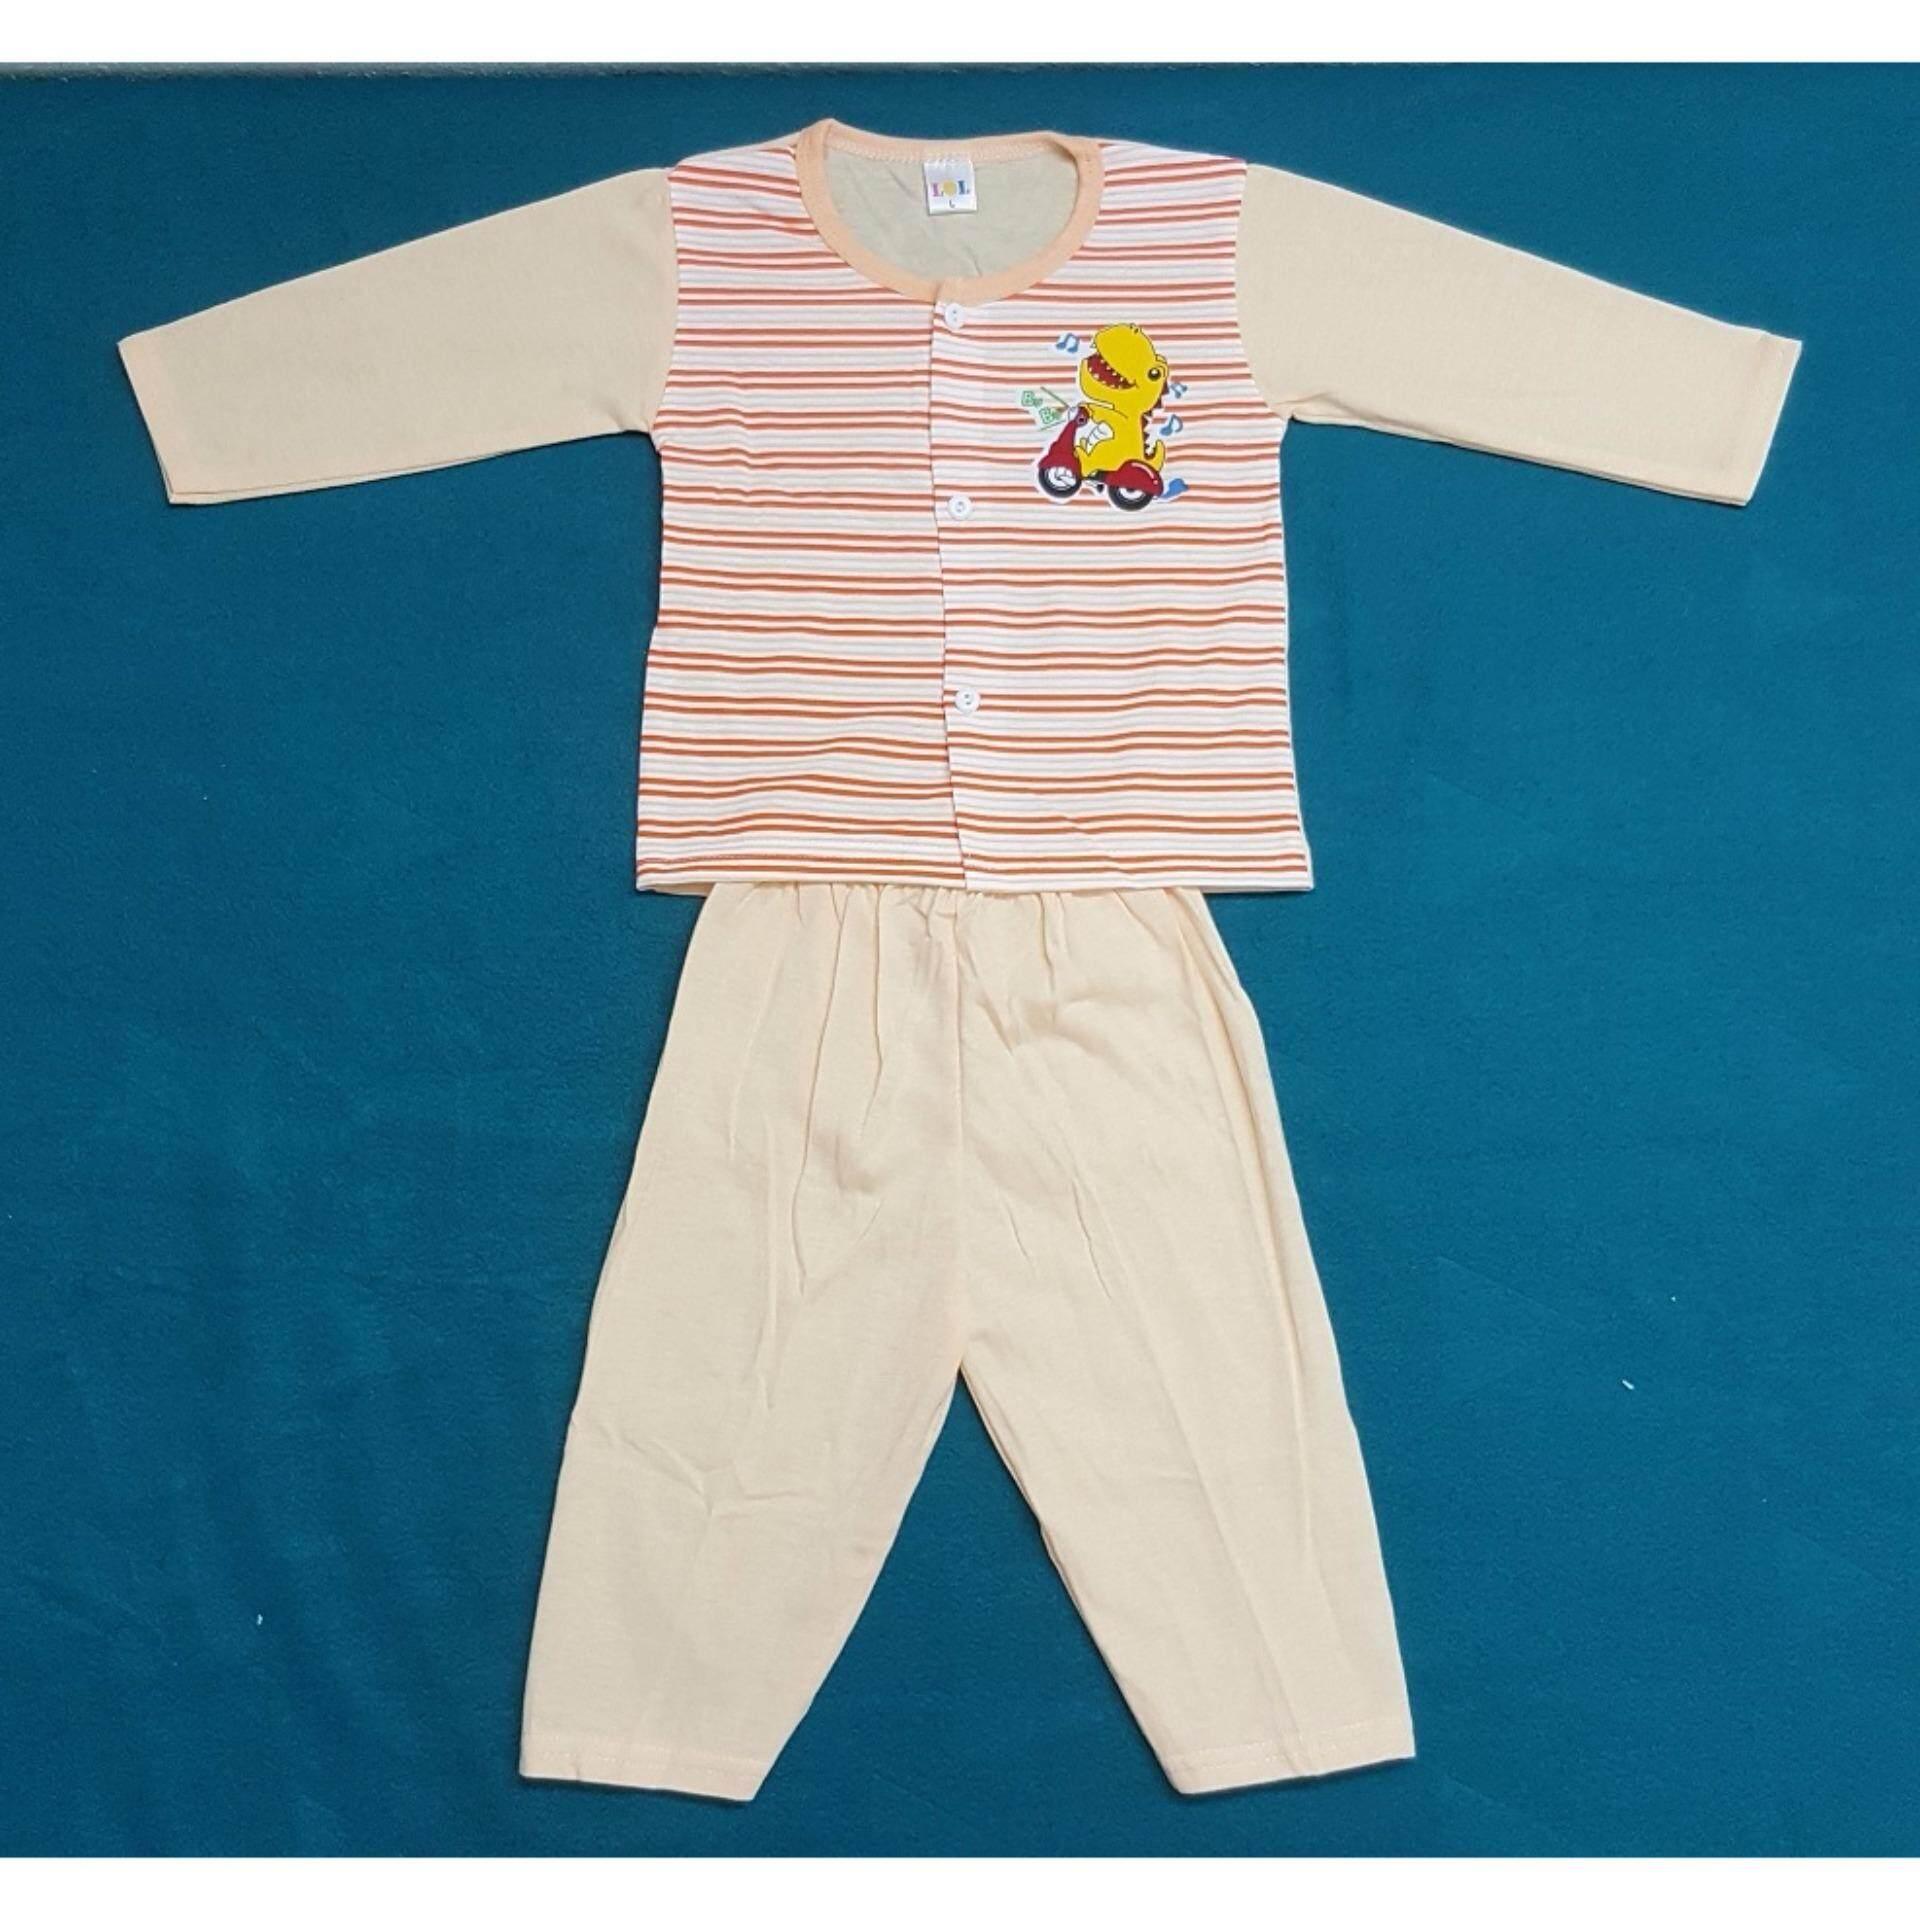 Newborn & Baby 3 SET Pajamas-004 (Fit to Age: 6-18Mth Mass:8-12kg Height:69-80CM)